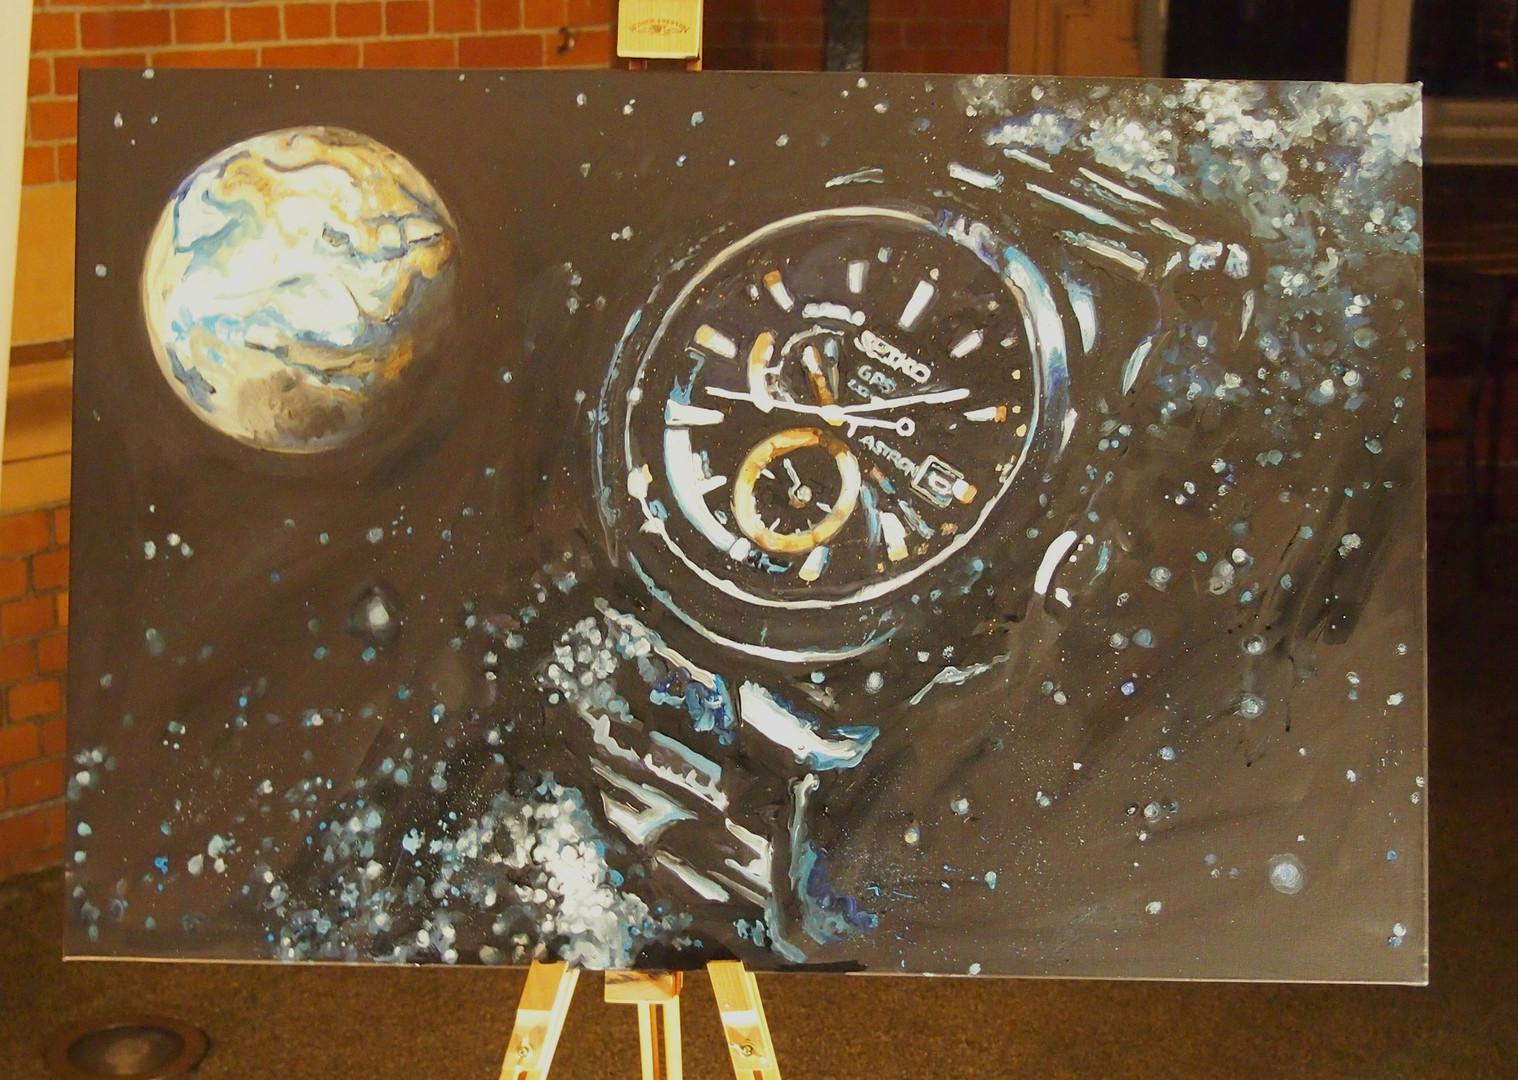 Seiko : Watch Launch : Greenwich Observatoty